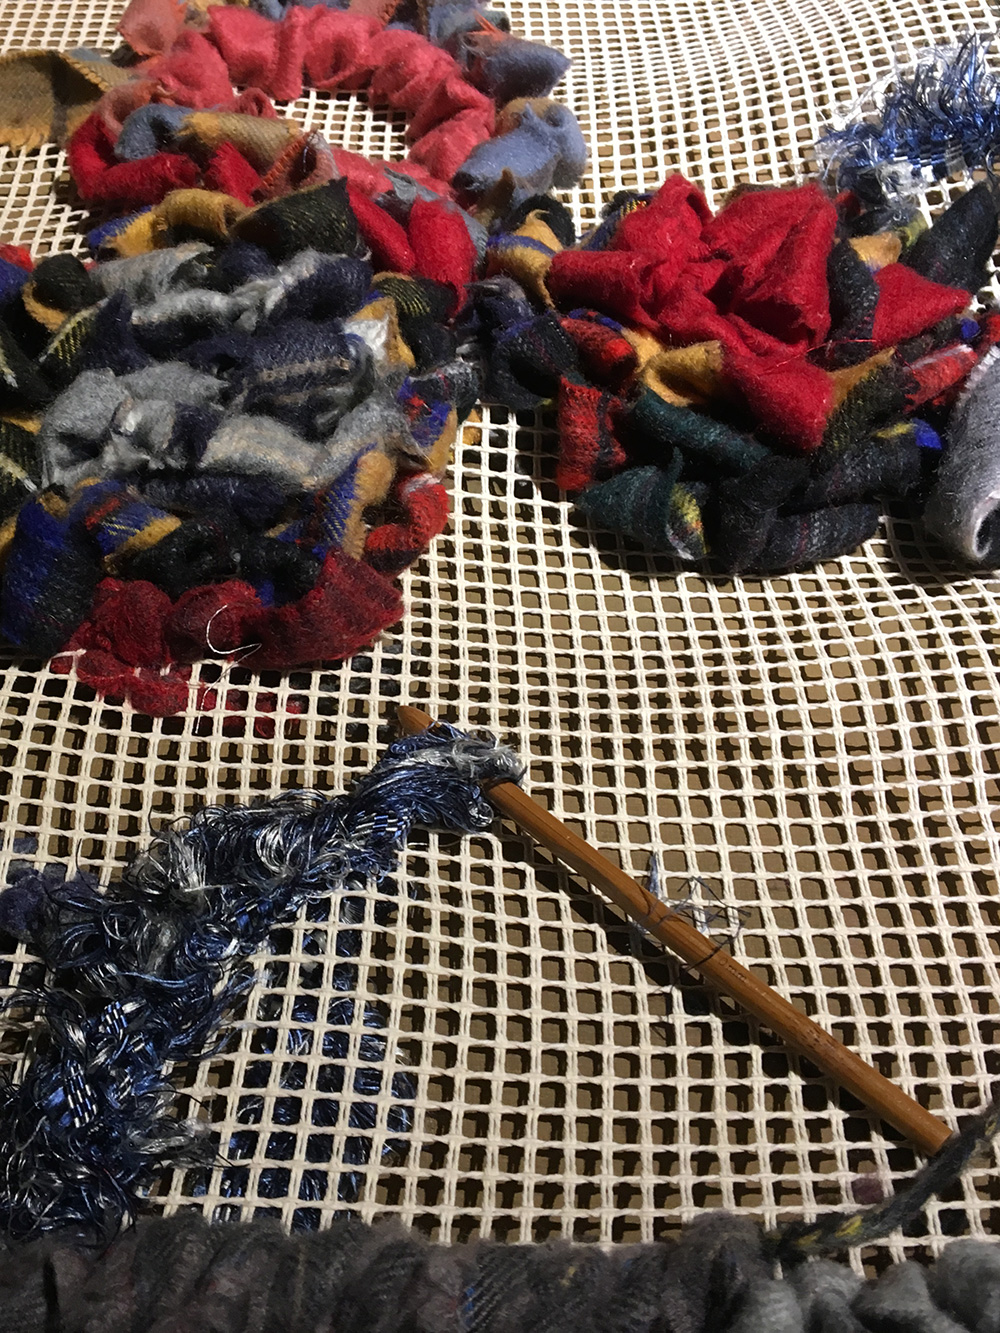 I used a large crochet hook.